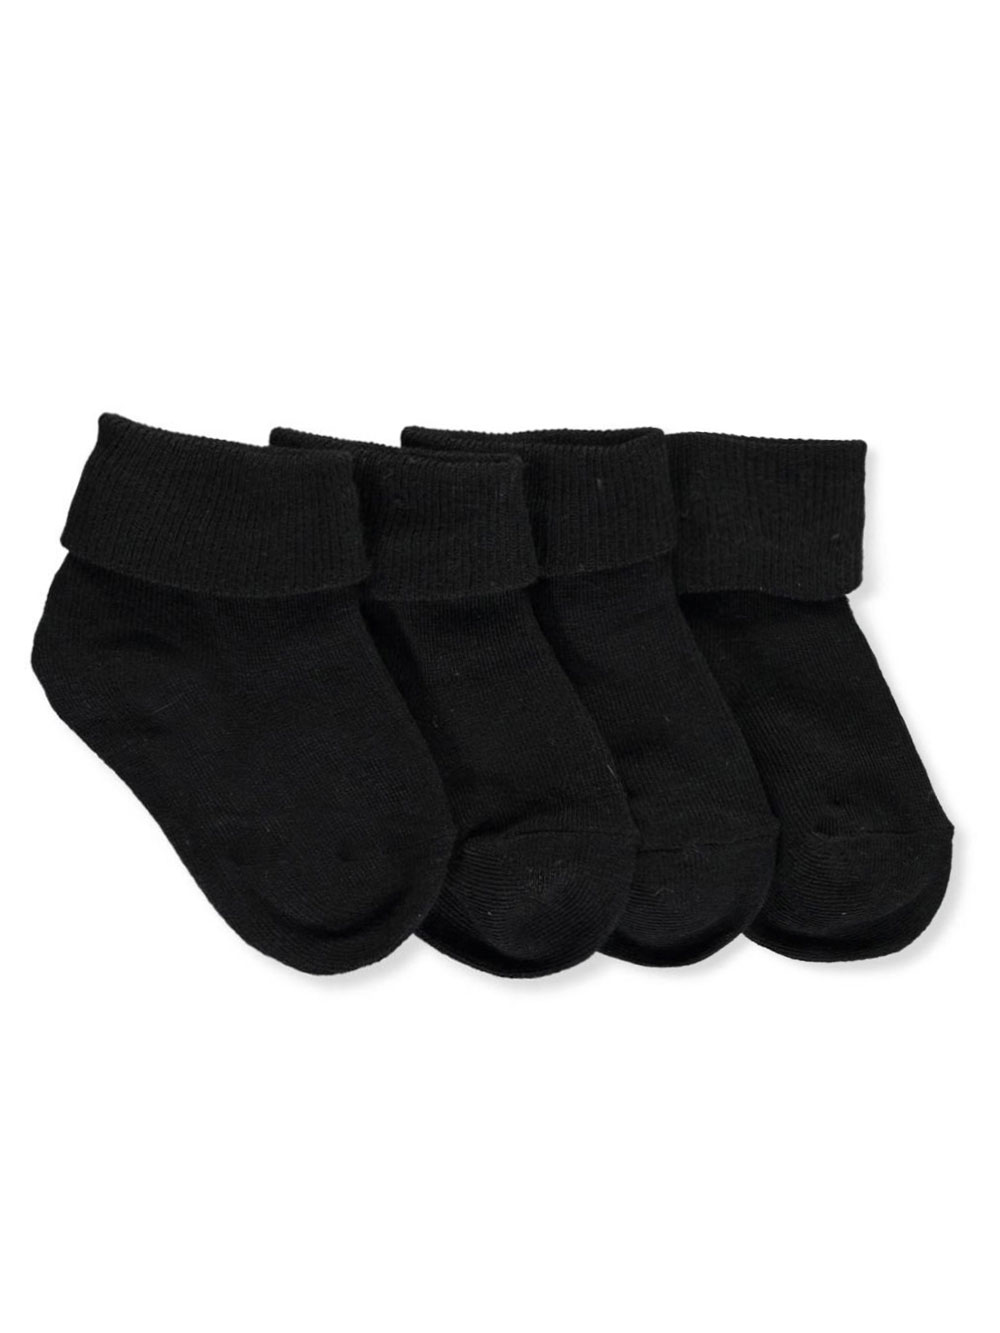 Cookie's Brand Triple Roll 2-Pack Socks (Sizes 5 - 11)